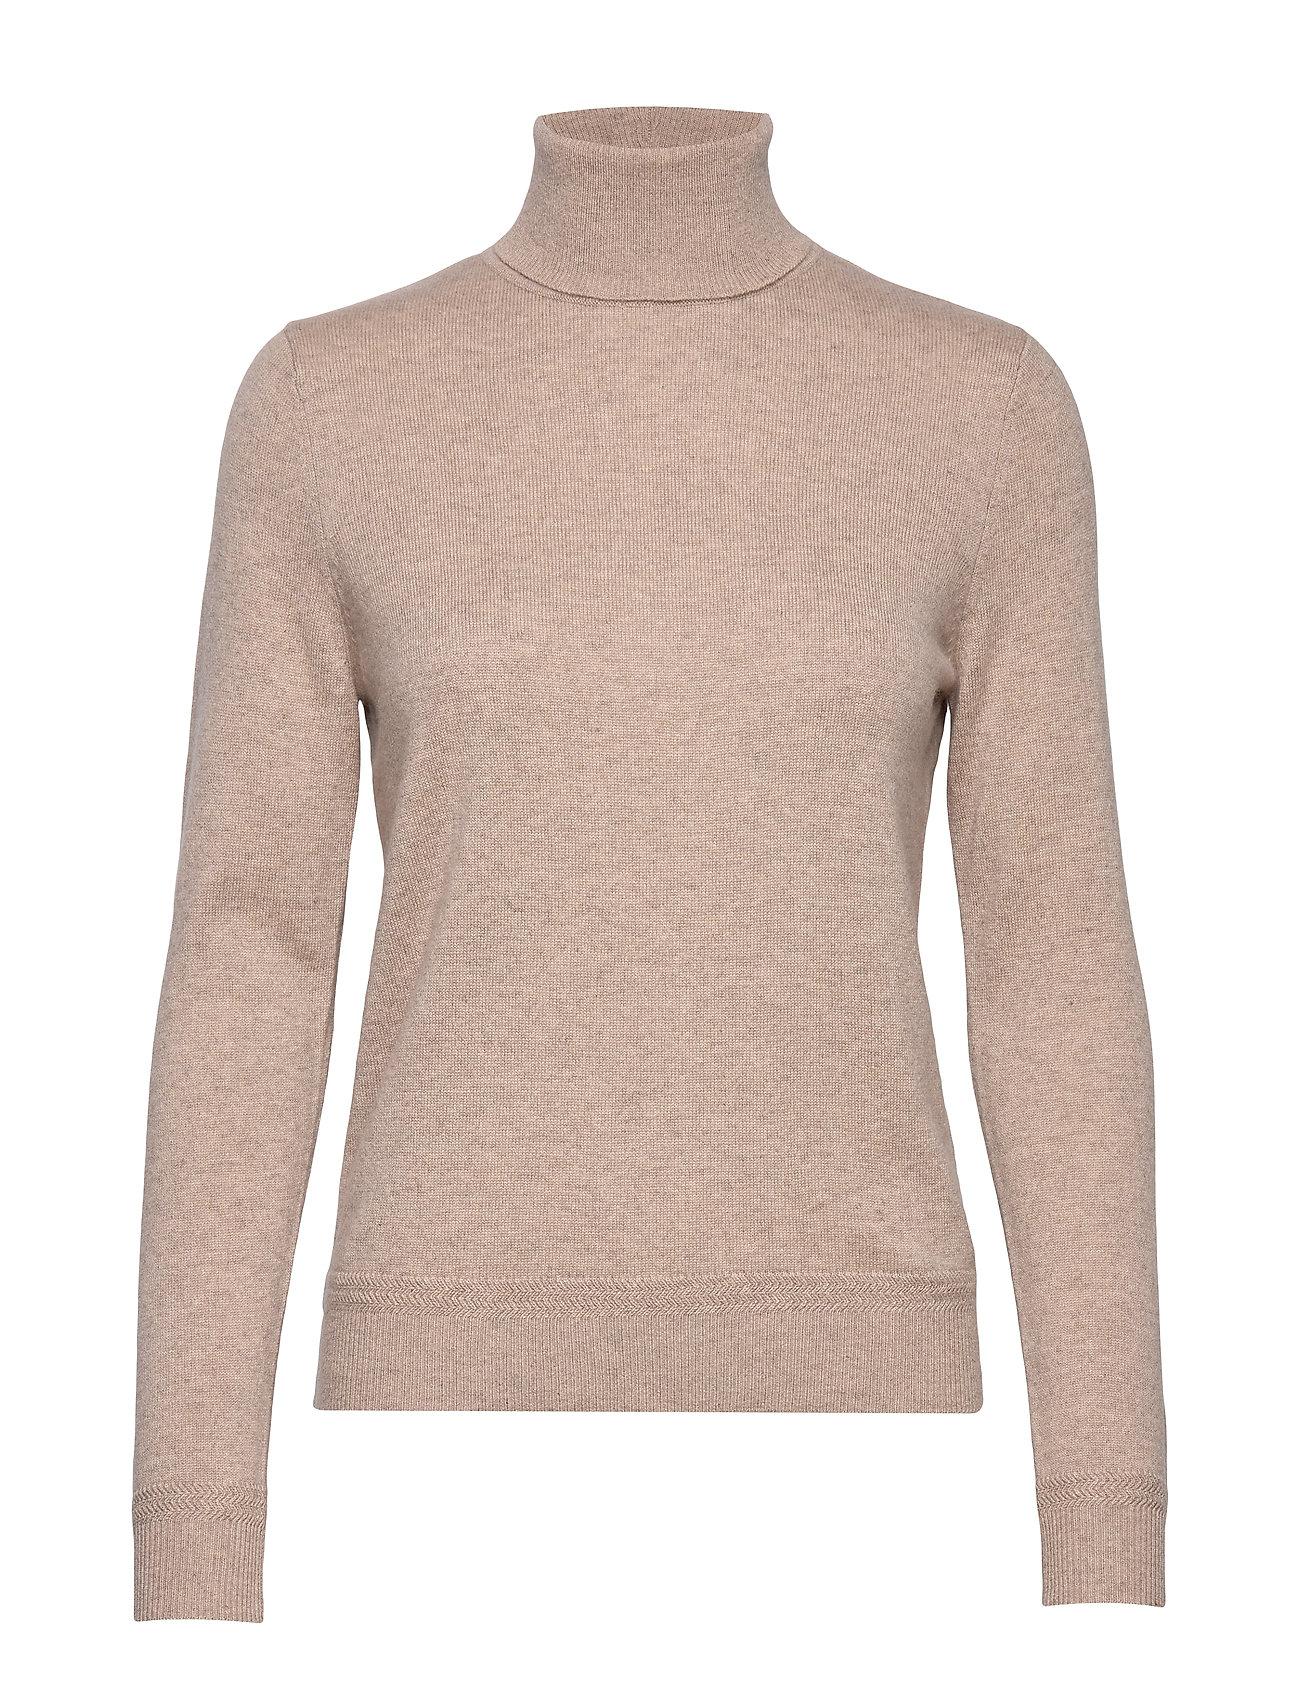 SELECTED Slfaya Zig Ls Knit Rollneck B Rollkragenpullover Poloshirt Beige SELECTED FEMME